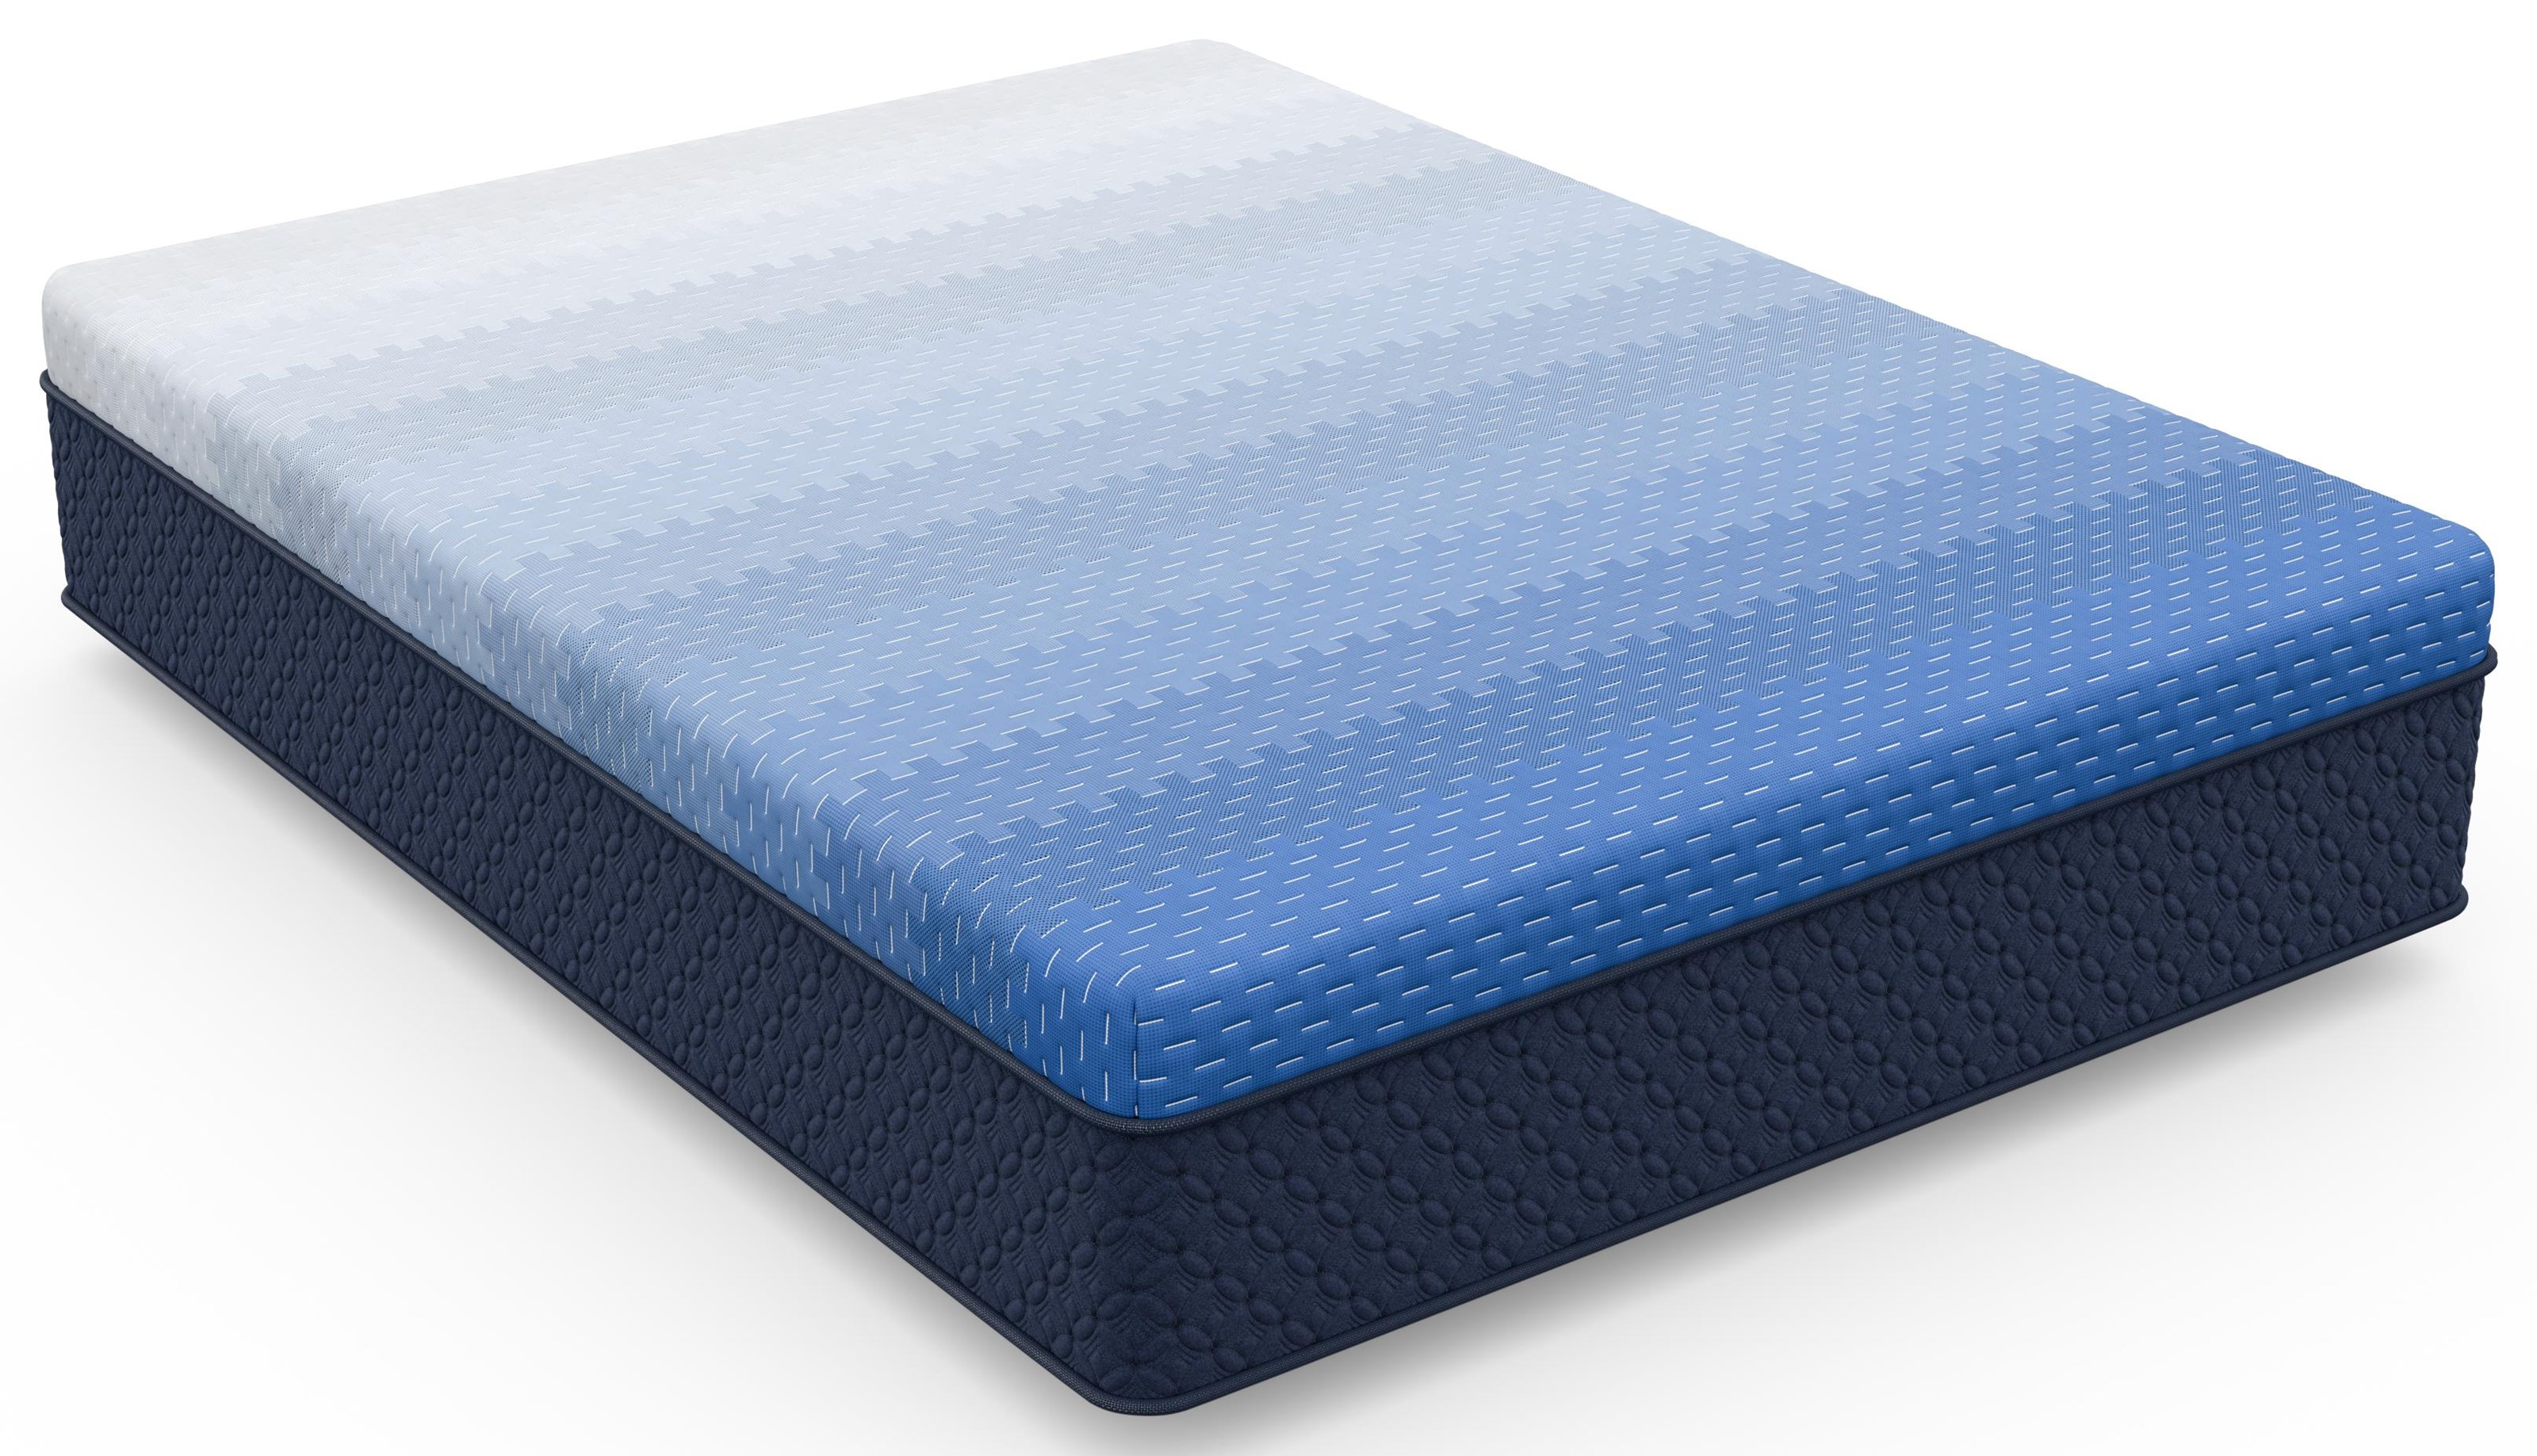 Lake Tahoe Queen Firm Gel Cooling Memory Foam Mattress by Diamond Mattress at Beck's Furniture